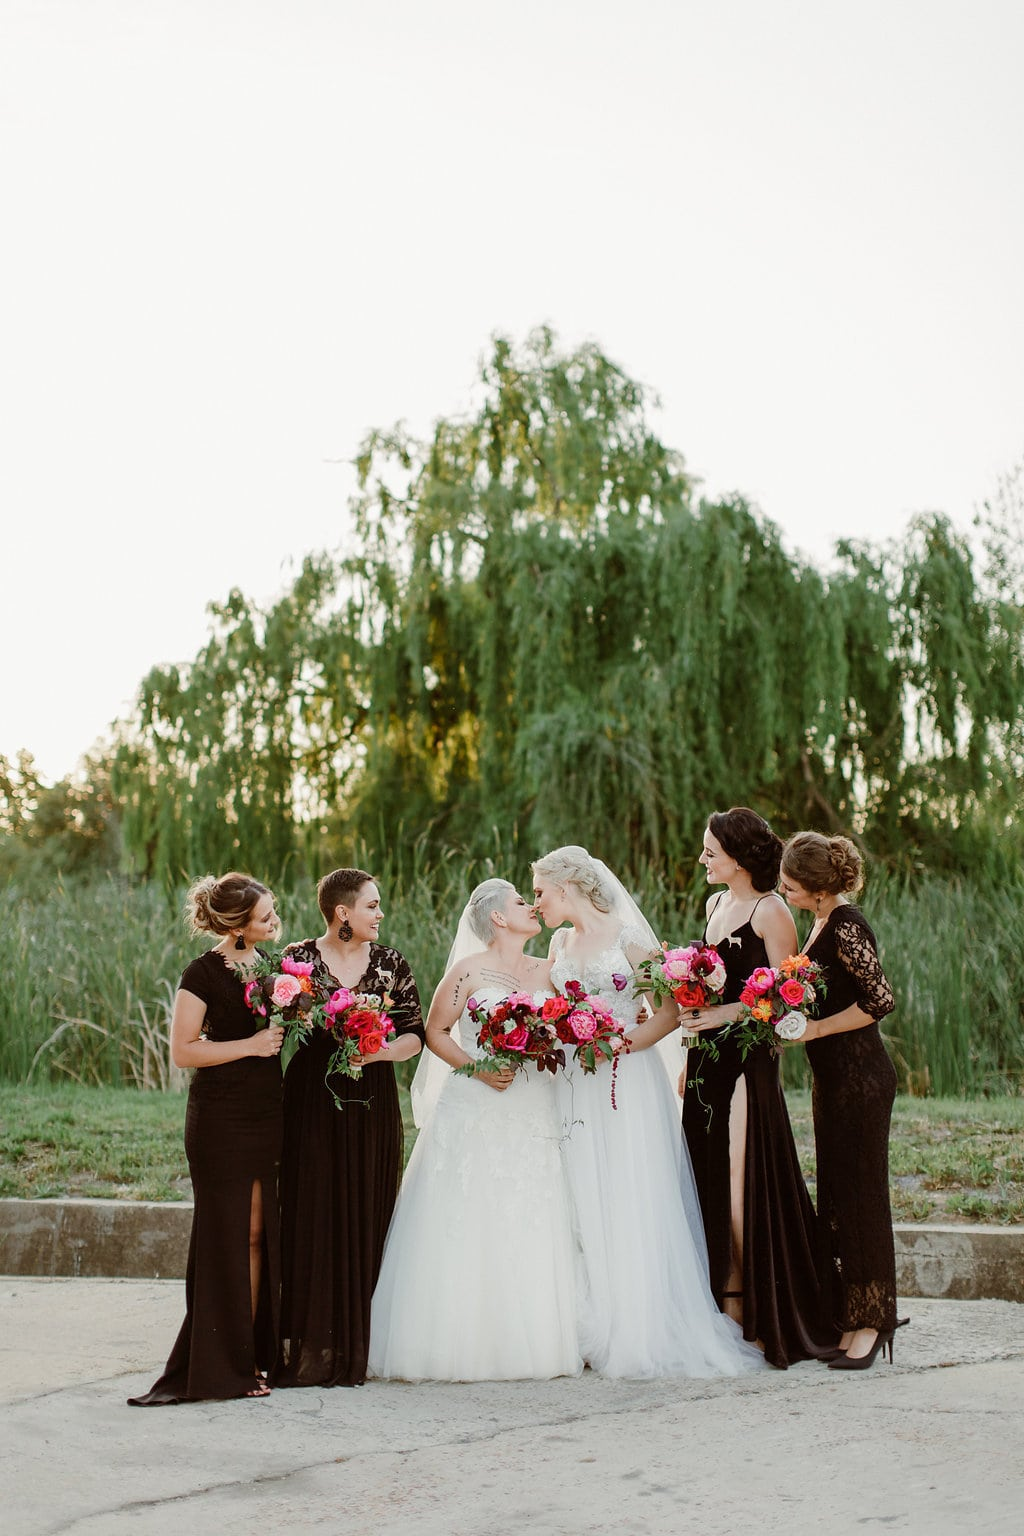 Brides with Bridesmaids | Image: Jenni Elizabeth